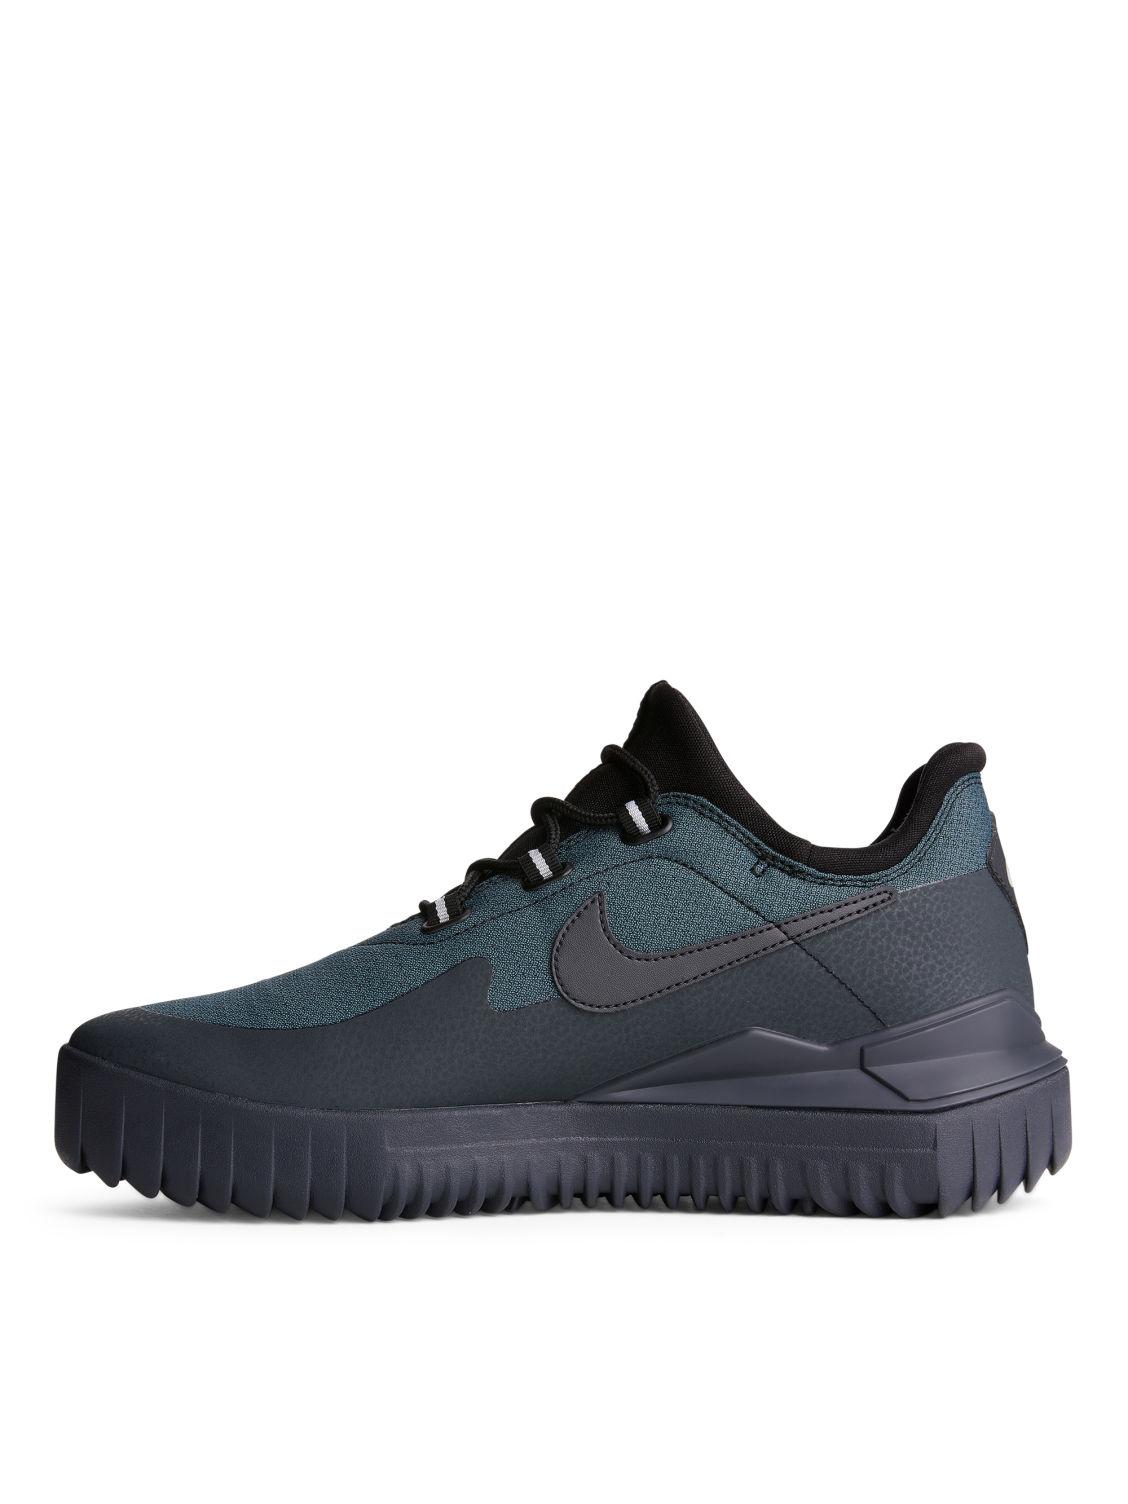 53bf55cbe727 nike air wild pegasus black medium blue flint grey